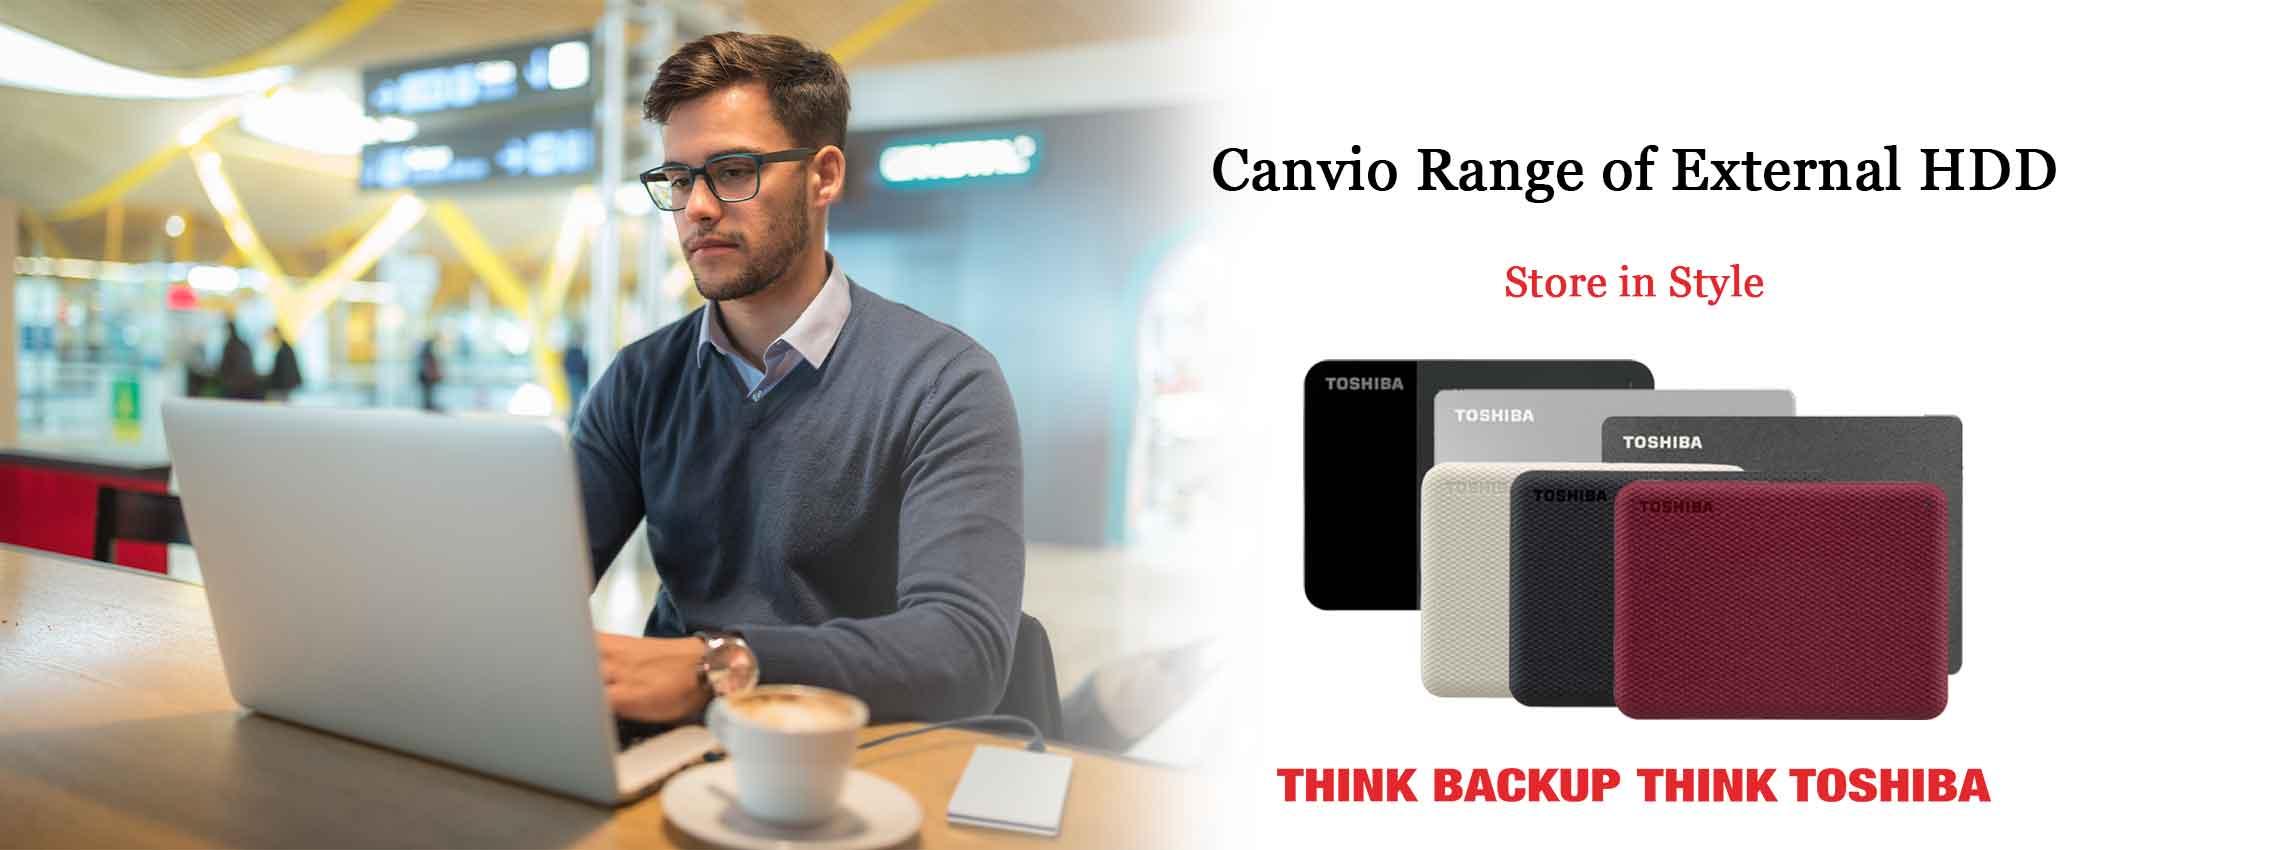 Canvio Range HDD